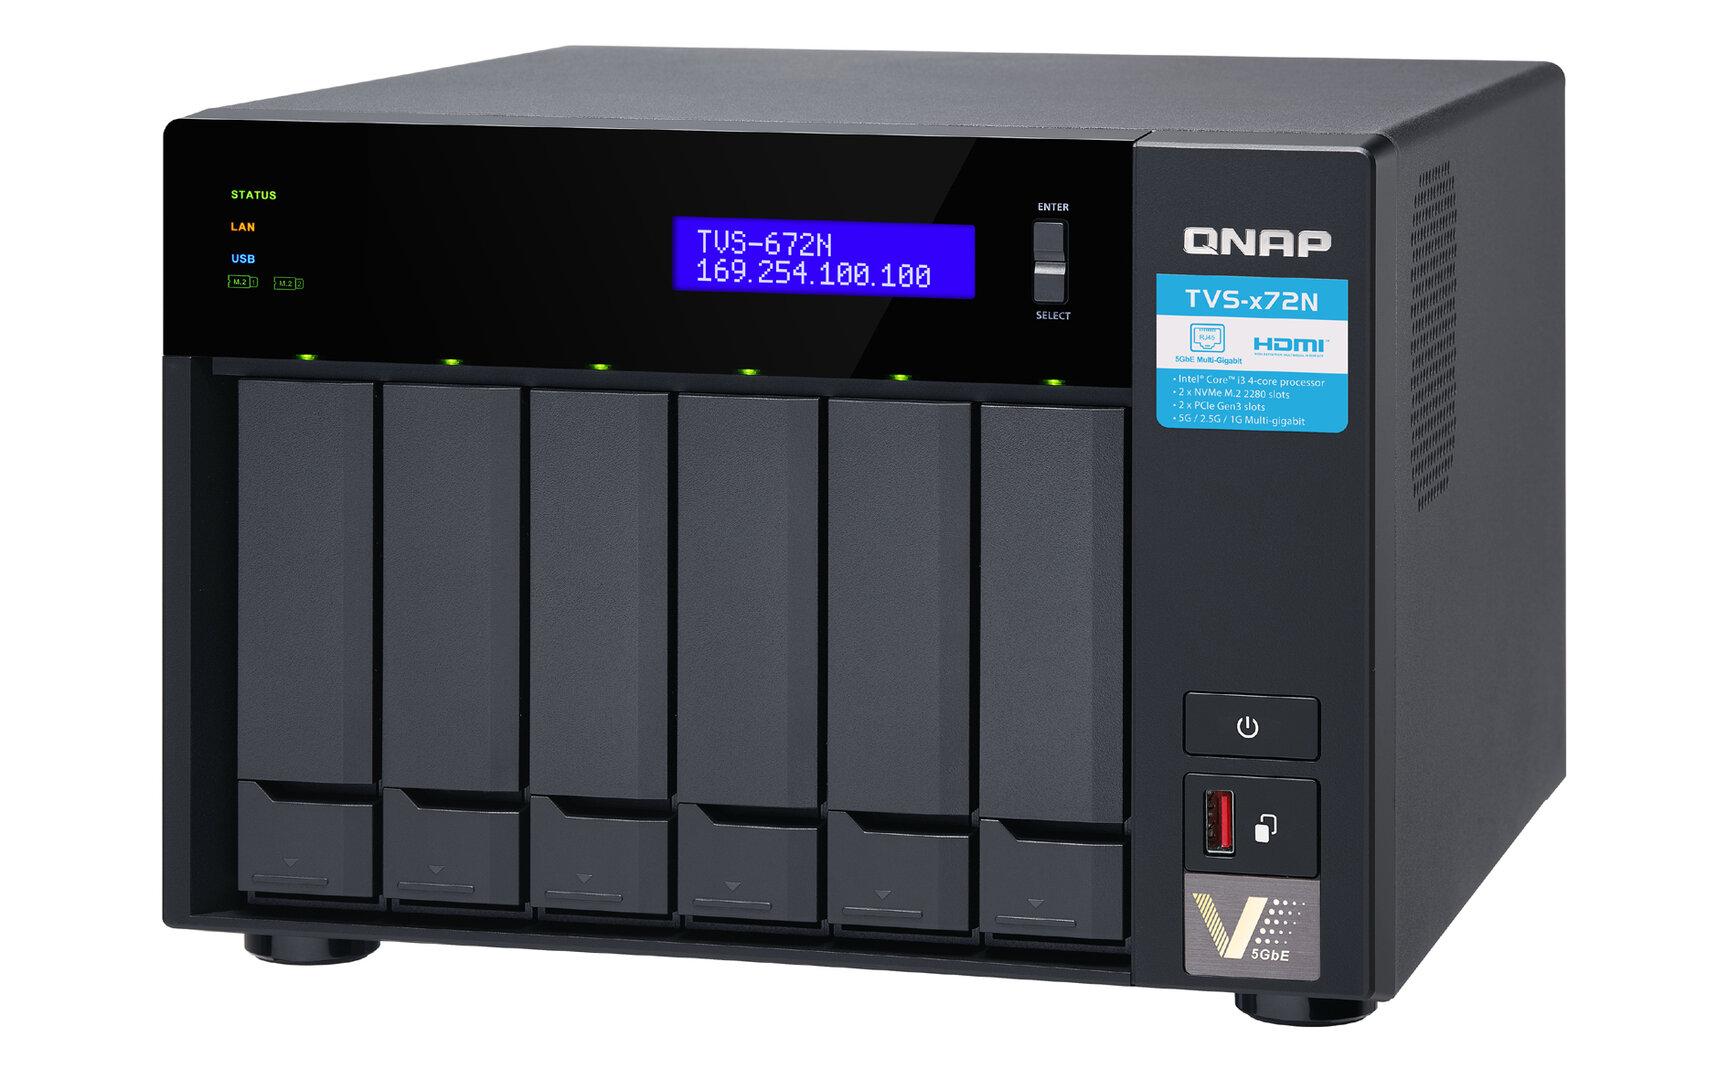 QNAP TVS-672N